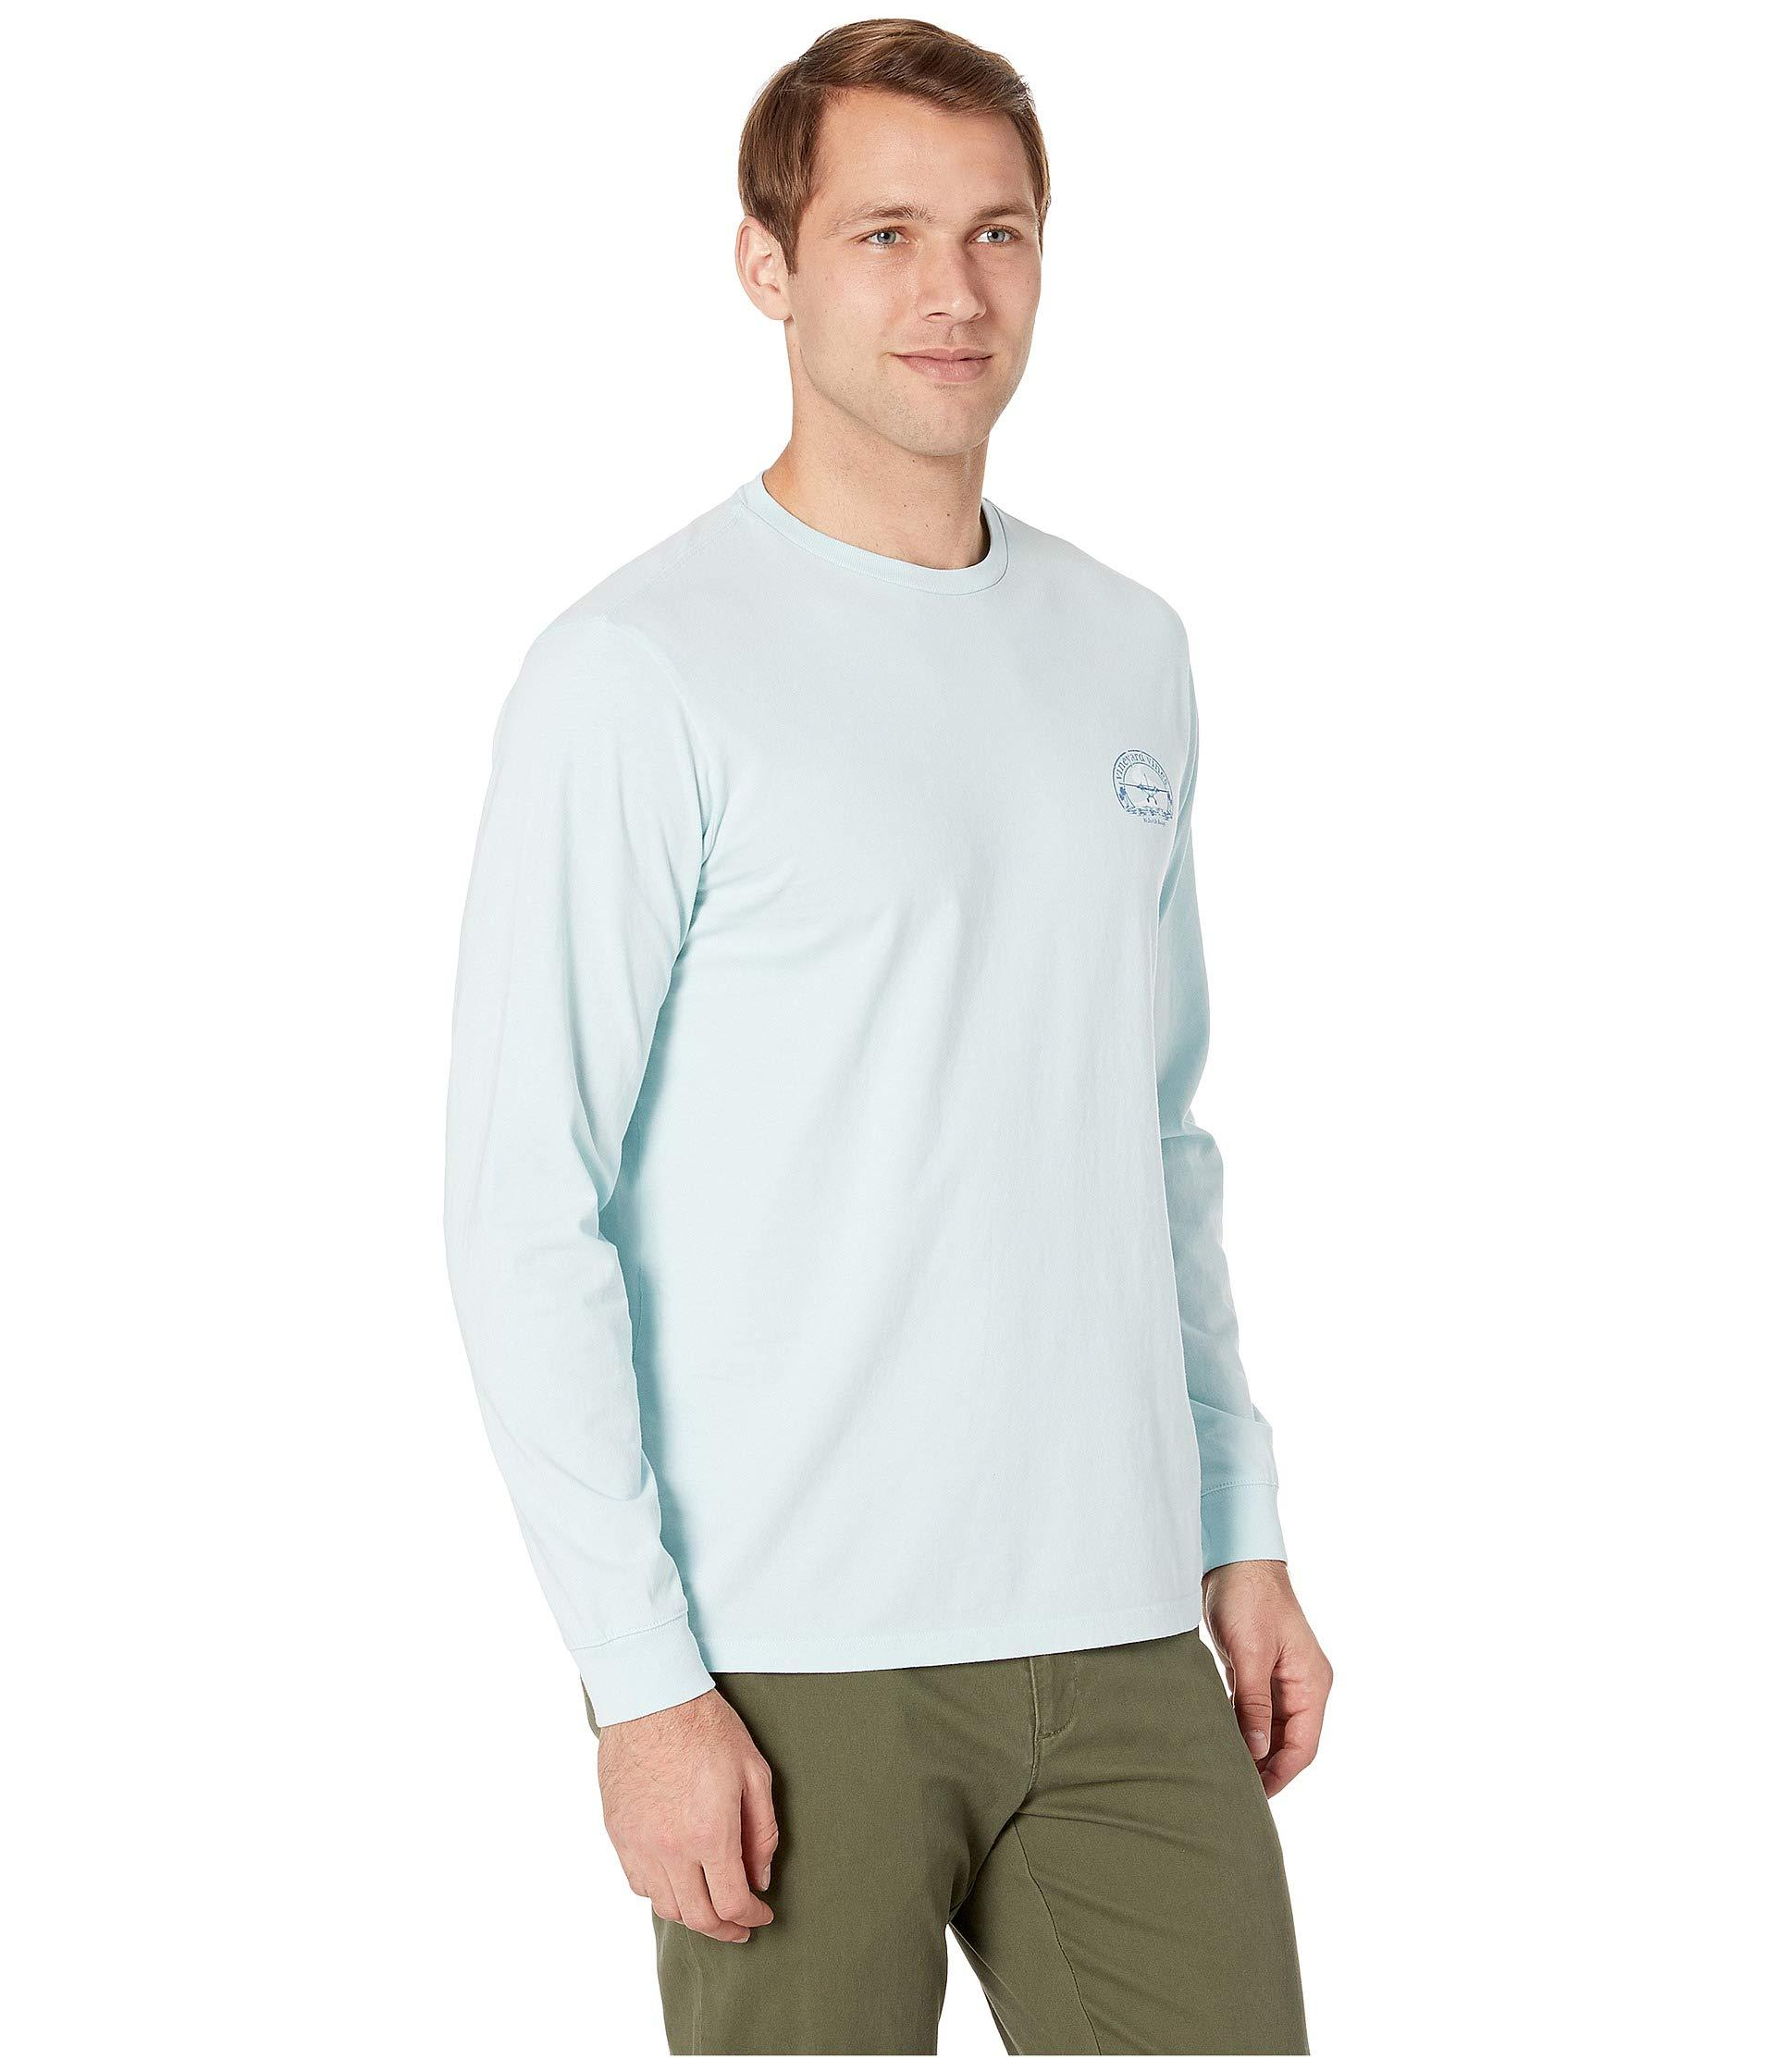 c88bcbf09 Vineyard Vines - Long Sleeve No Runway Tee (misty Blue) Men's T Shirt for.  View fullscreen